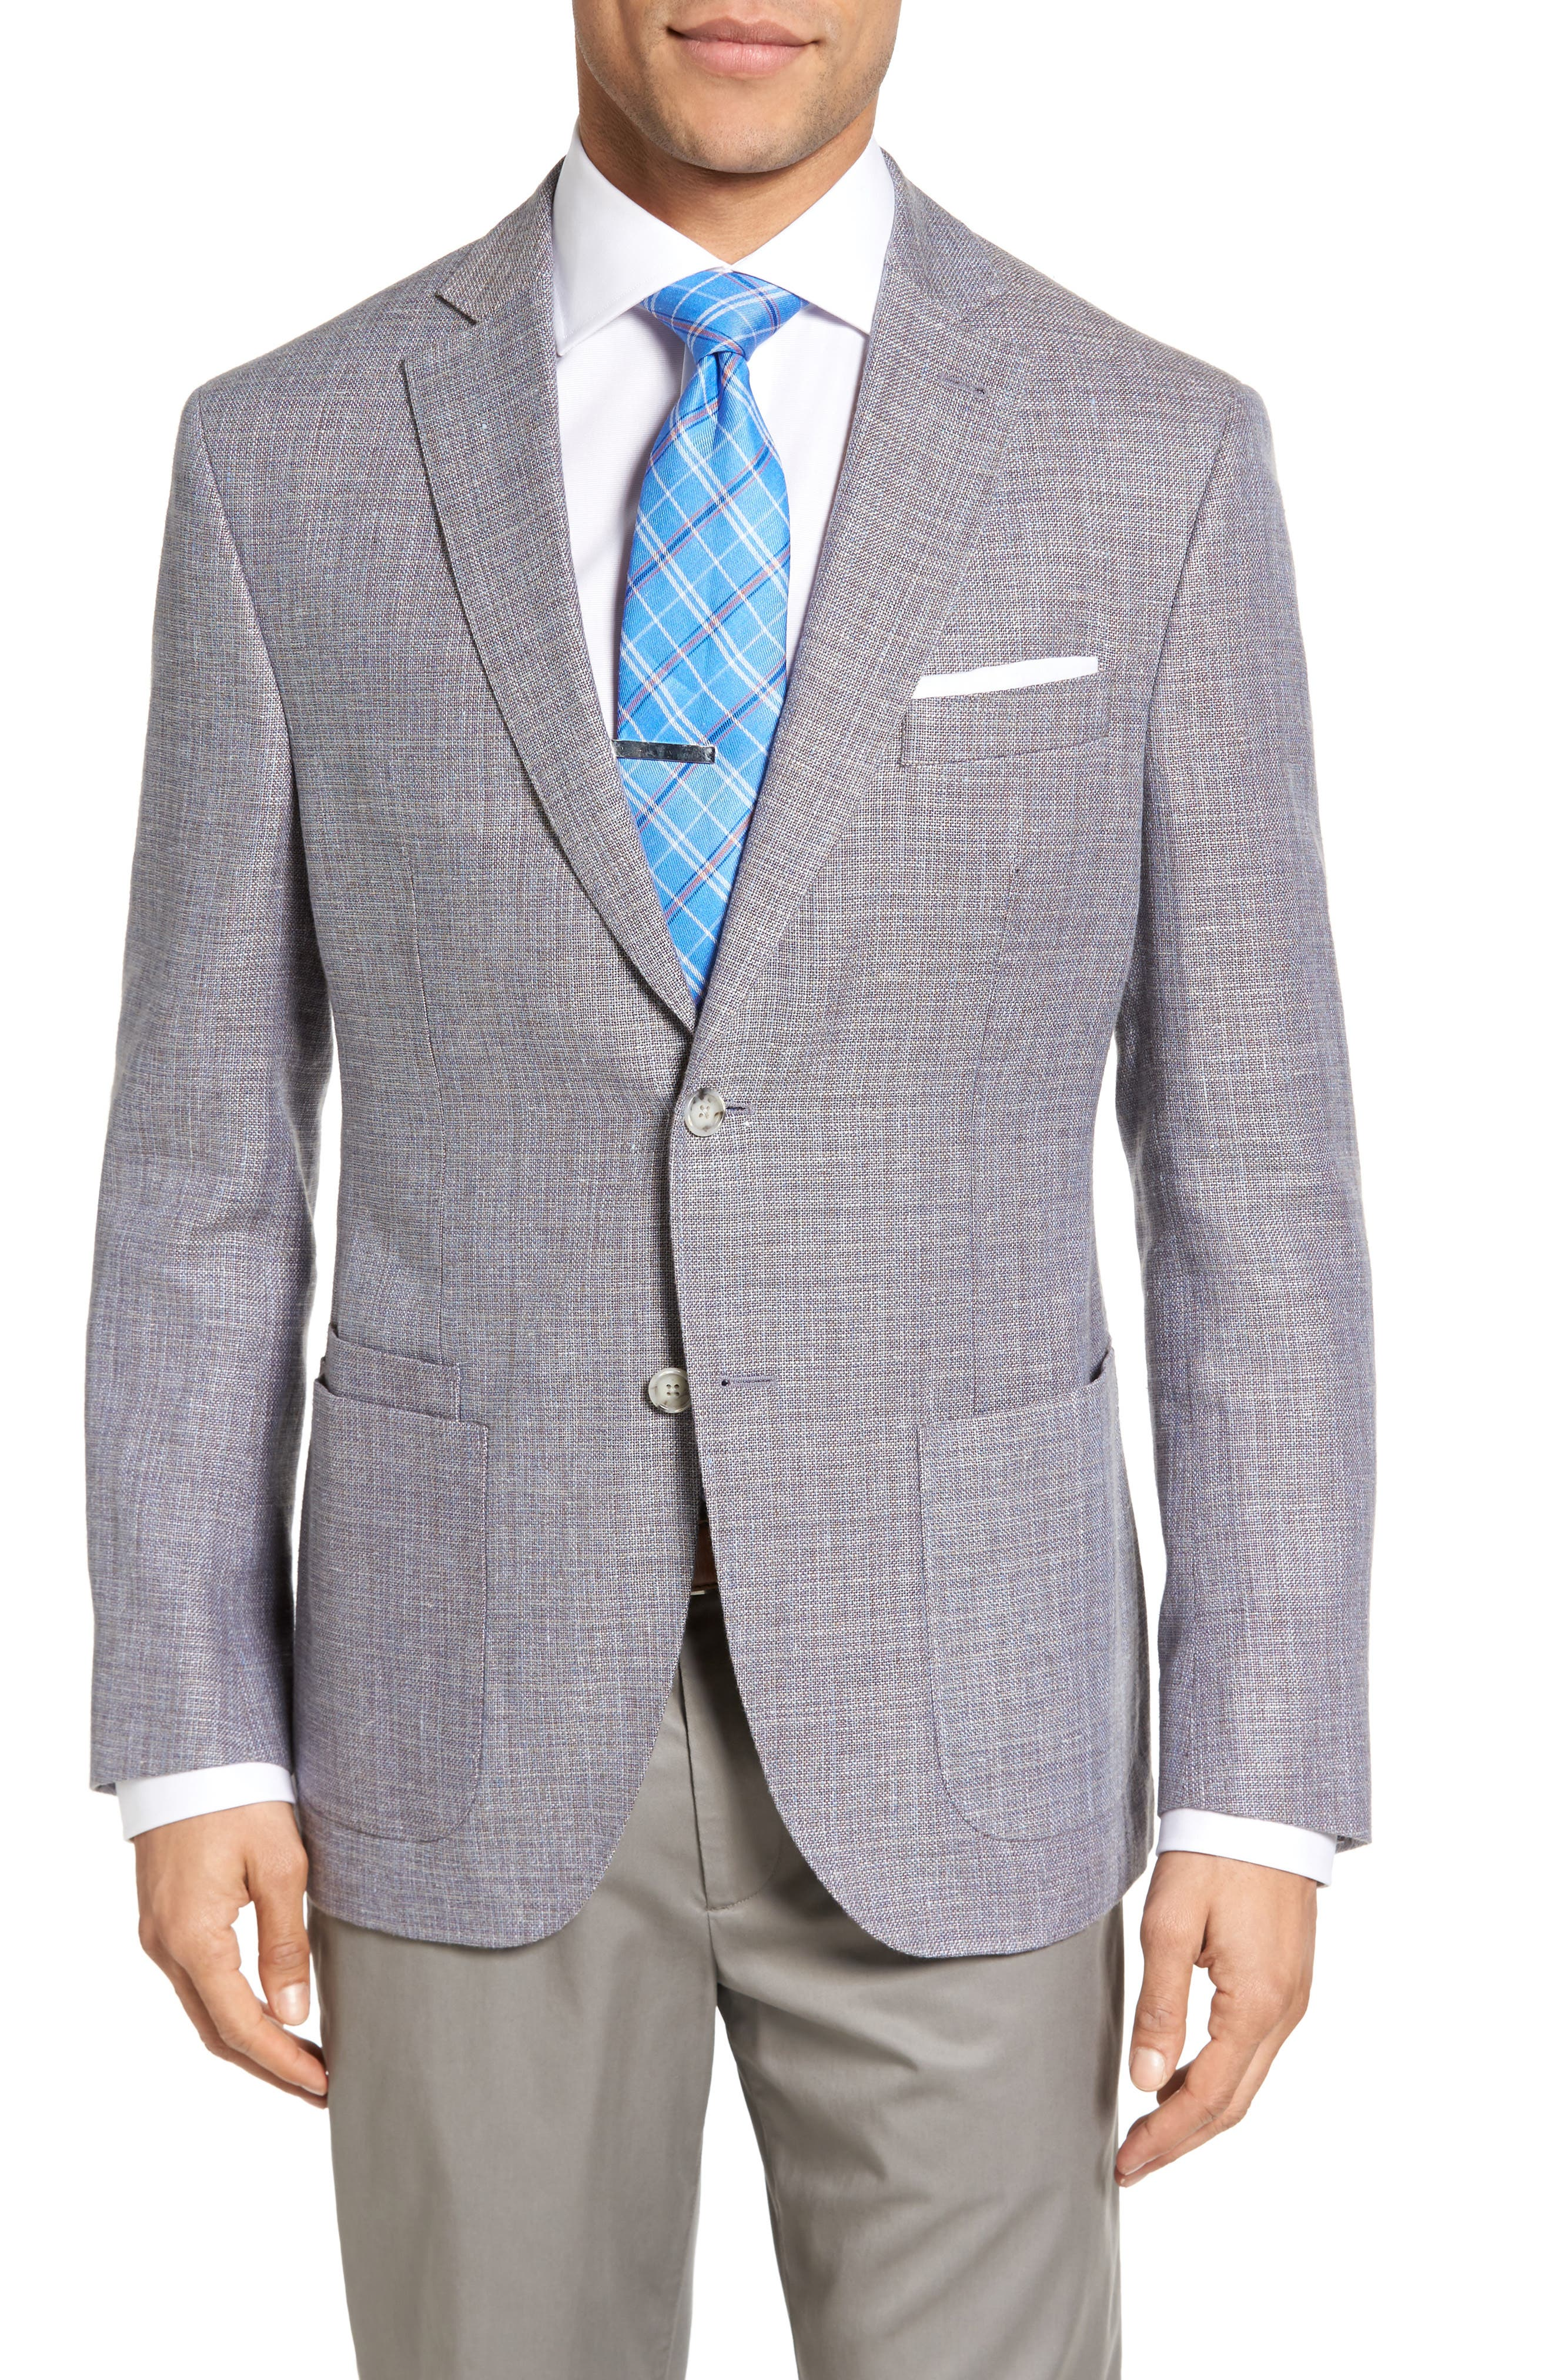 JKT NEW YORK Trim Fit Wool & Linen Blazer, Main, color, 020